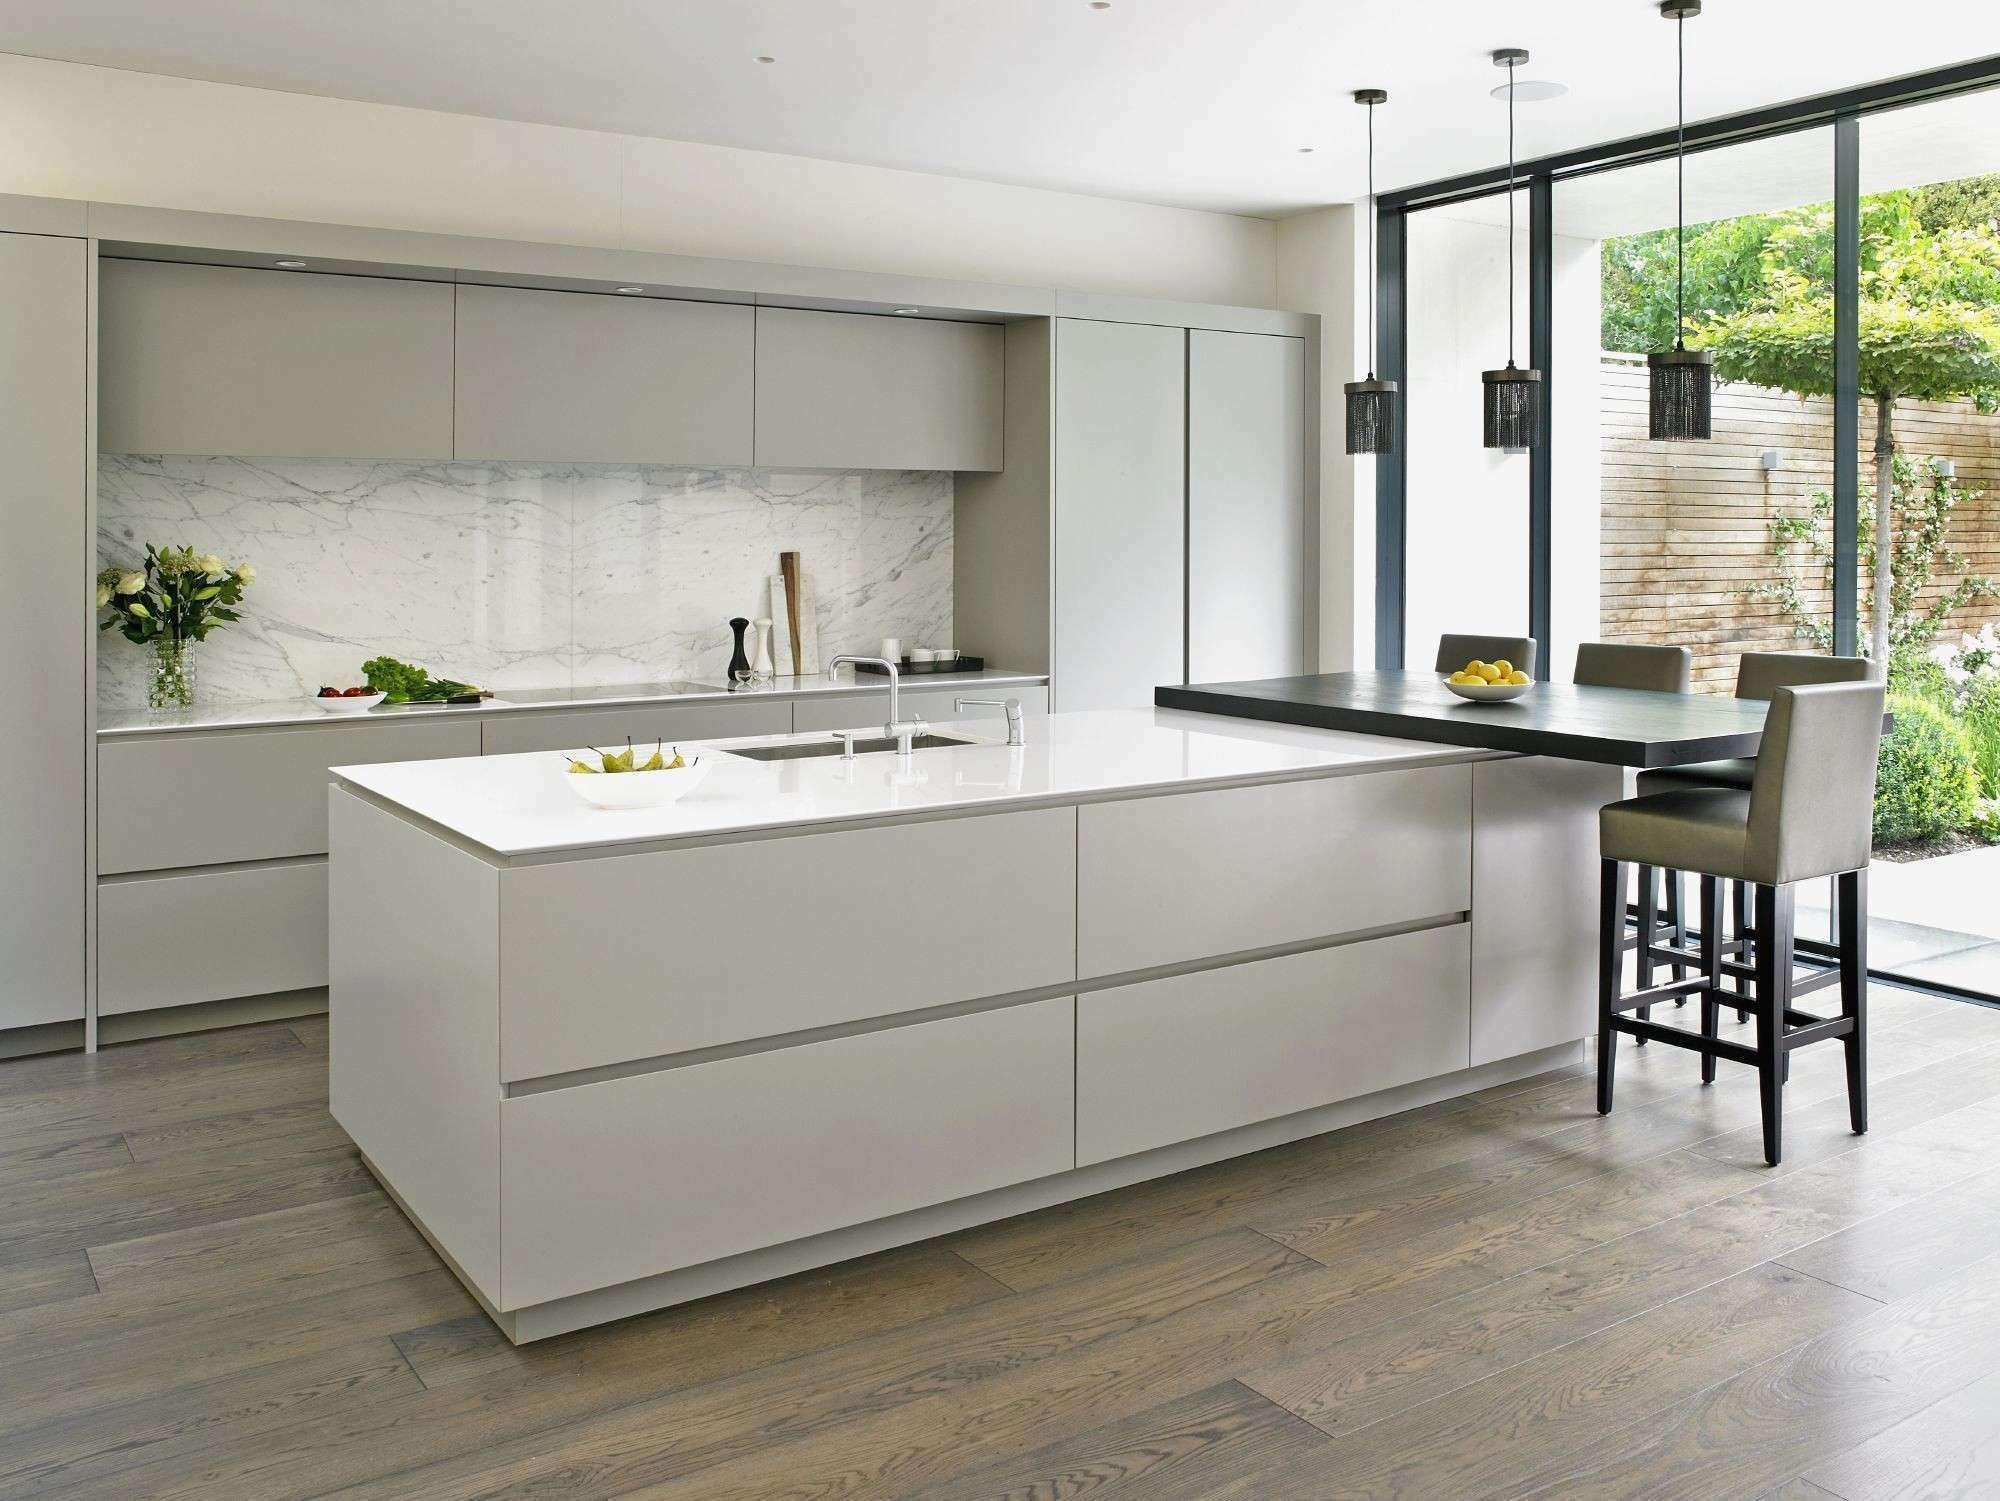 9 Full Backsplash Kitchen Photos Kitchen Layout Handleless Kitchen Contemporary Kitchen